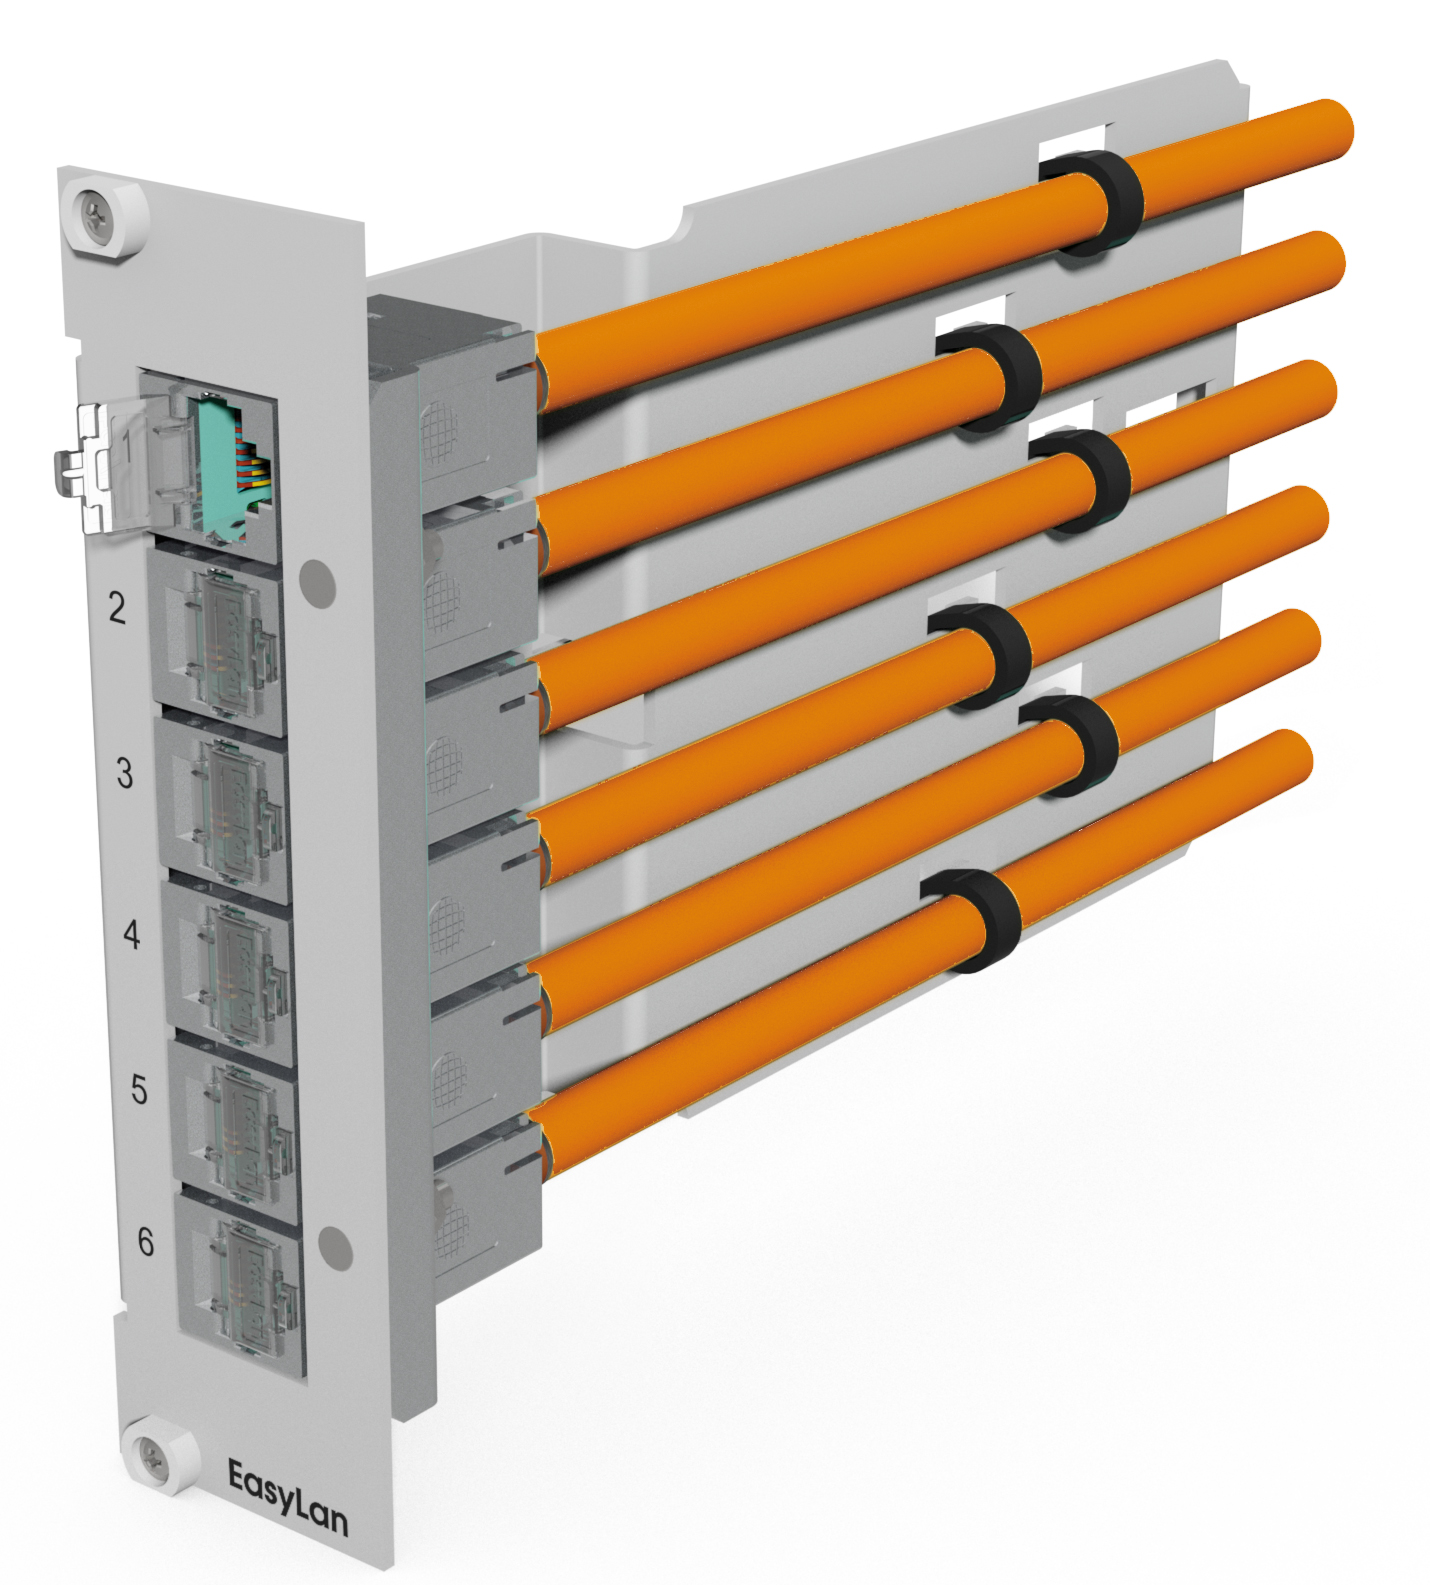 1 Stk preLink/fixLink -Einschubmodul 6xRJ45, 7TE, für Modulträger HEKBM07---